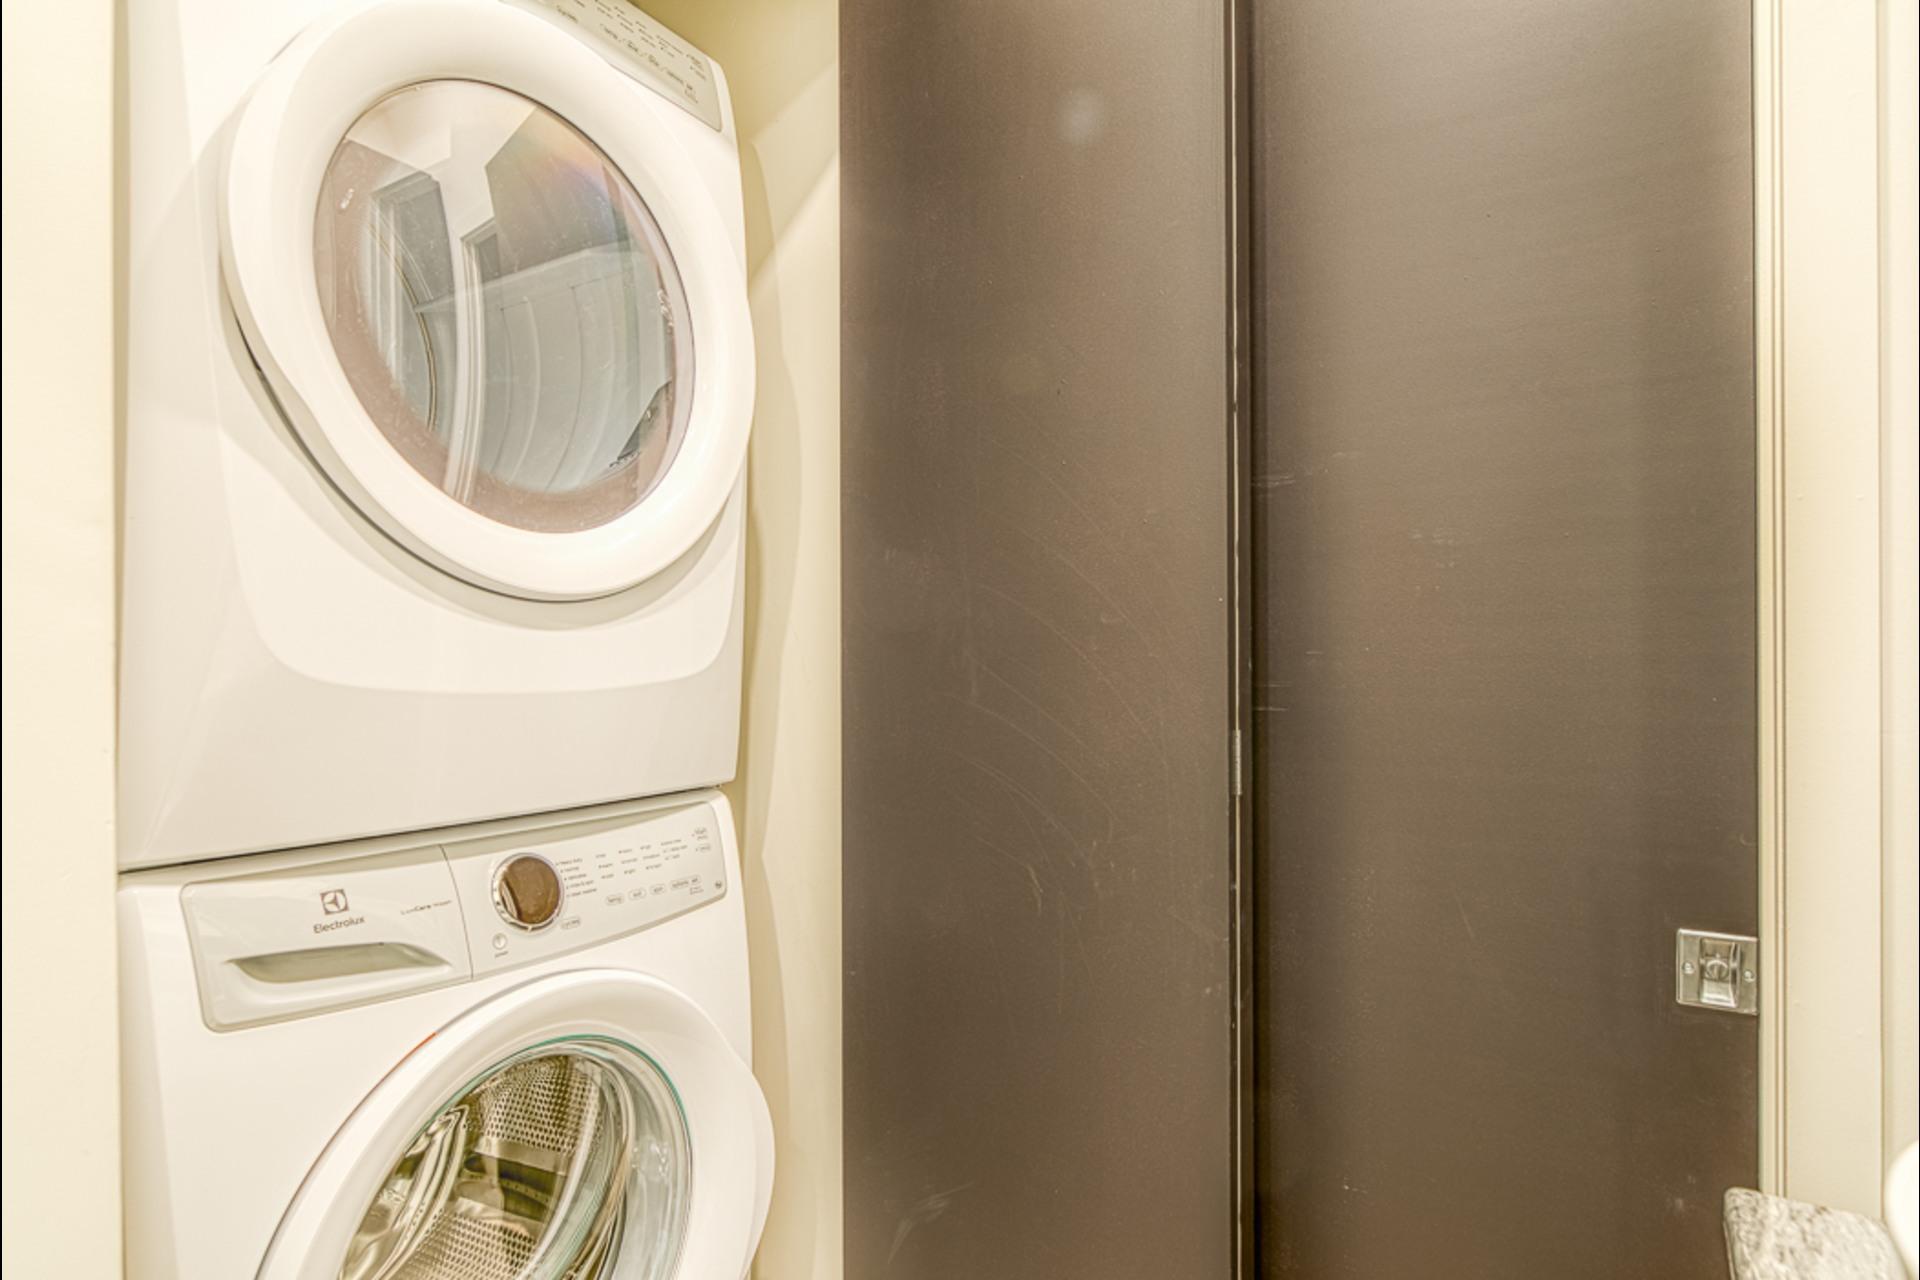 image 10 - Furnished Appartement For rent Montréal - 3 rooms